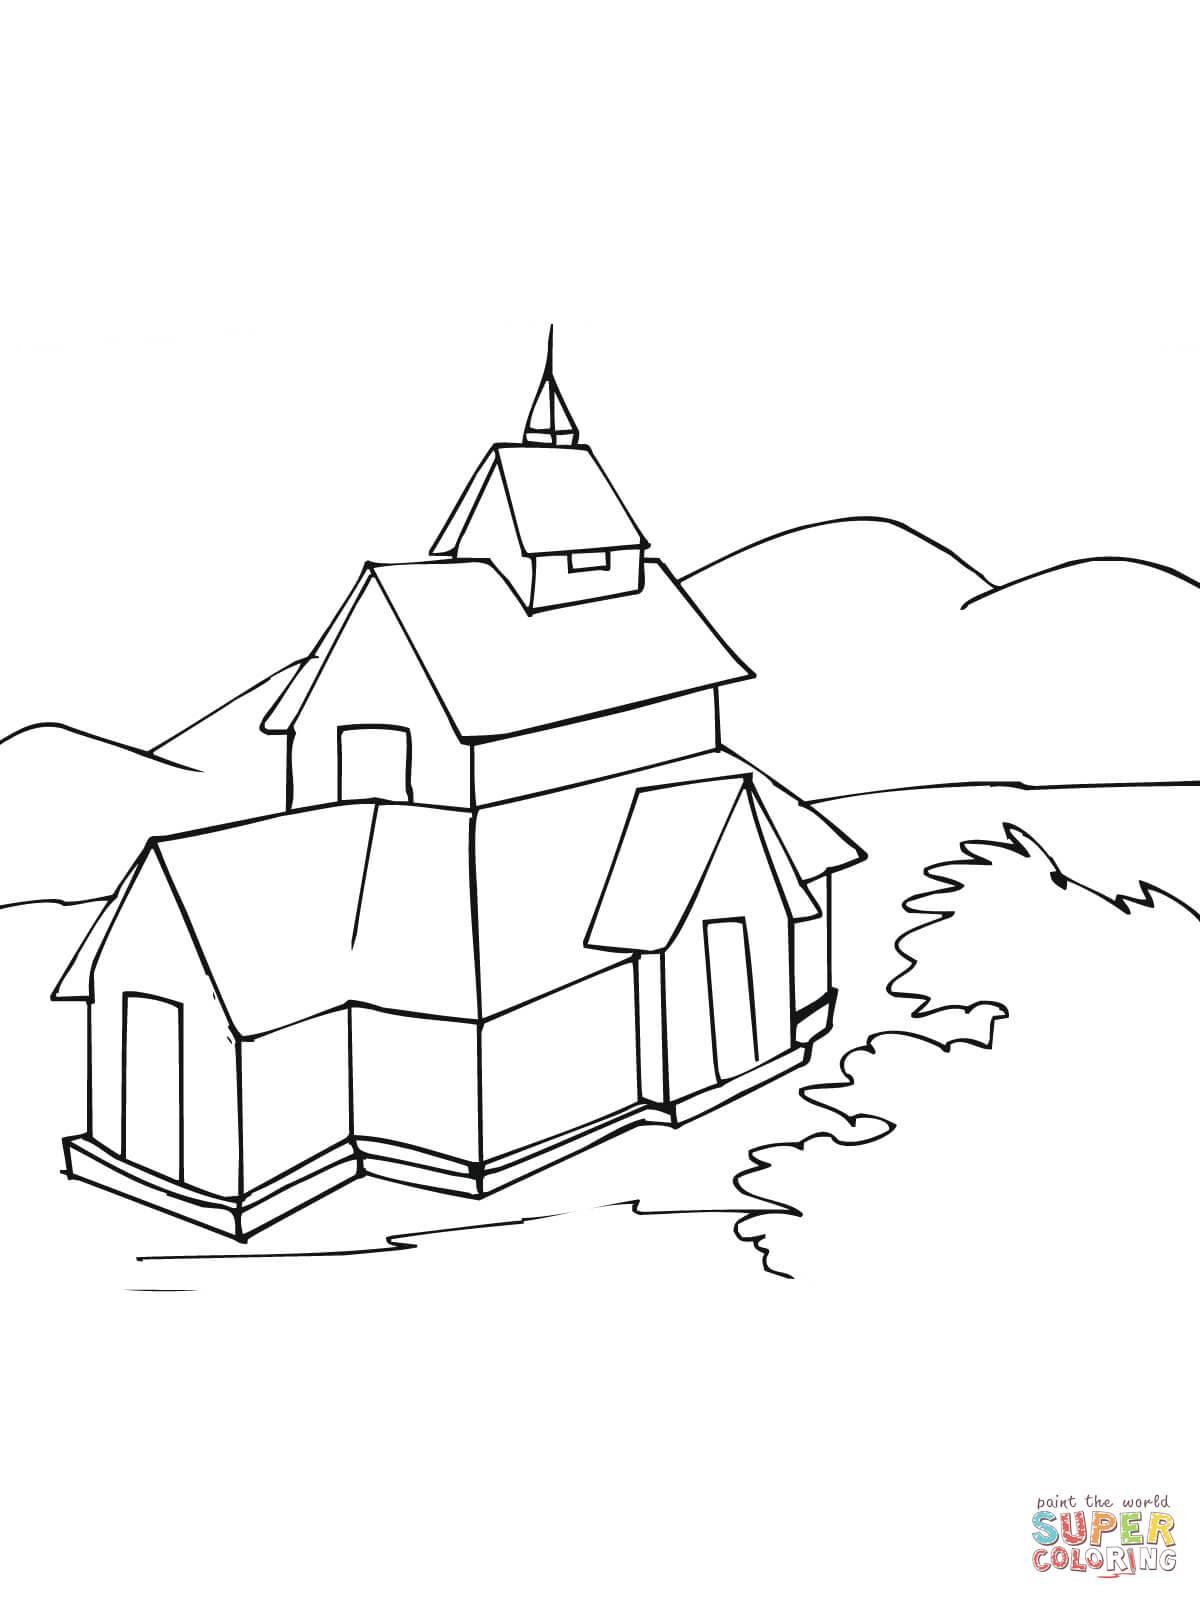 Dibujo De Stavkirke Iglesia De Madera Noruega Para Colorear